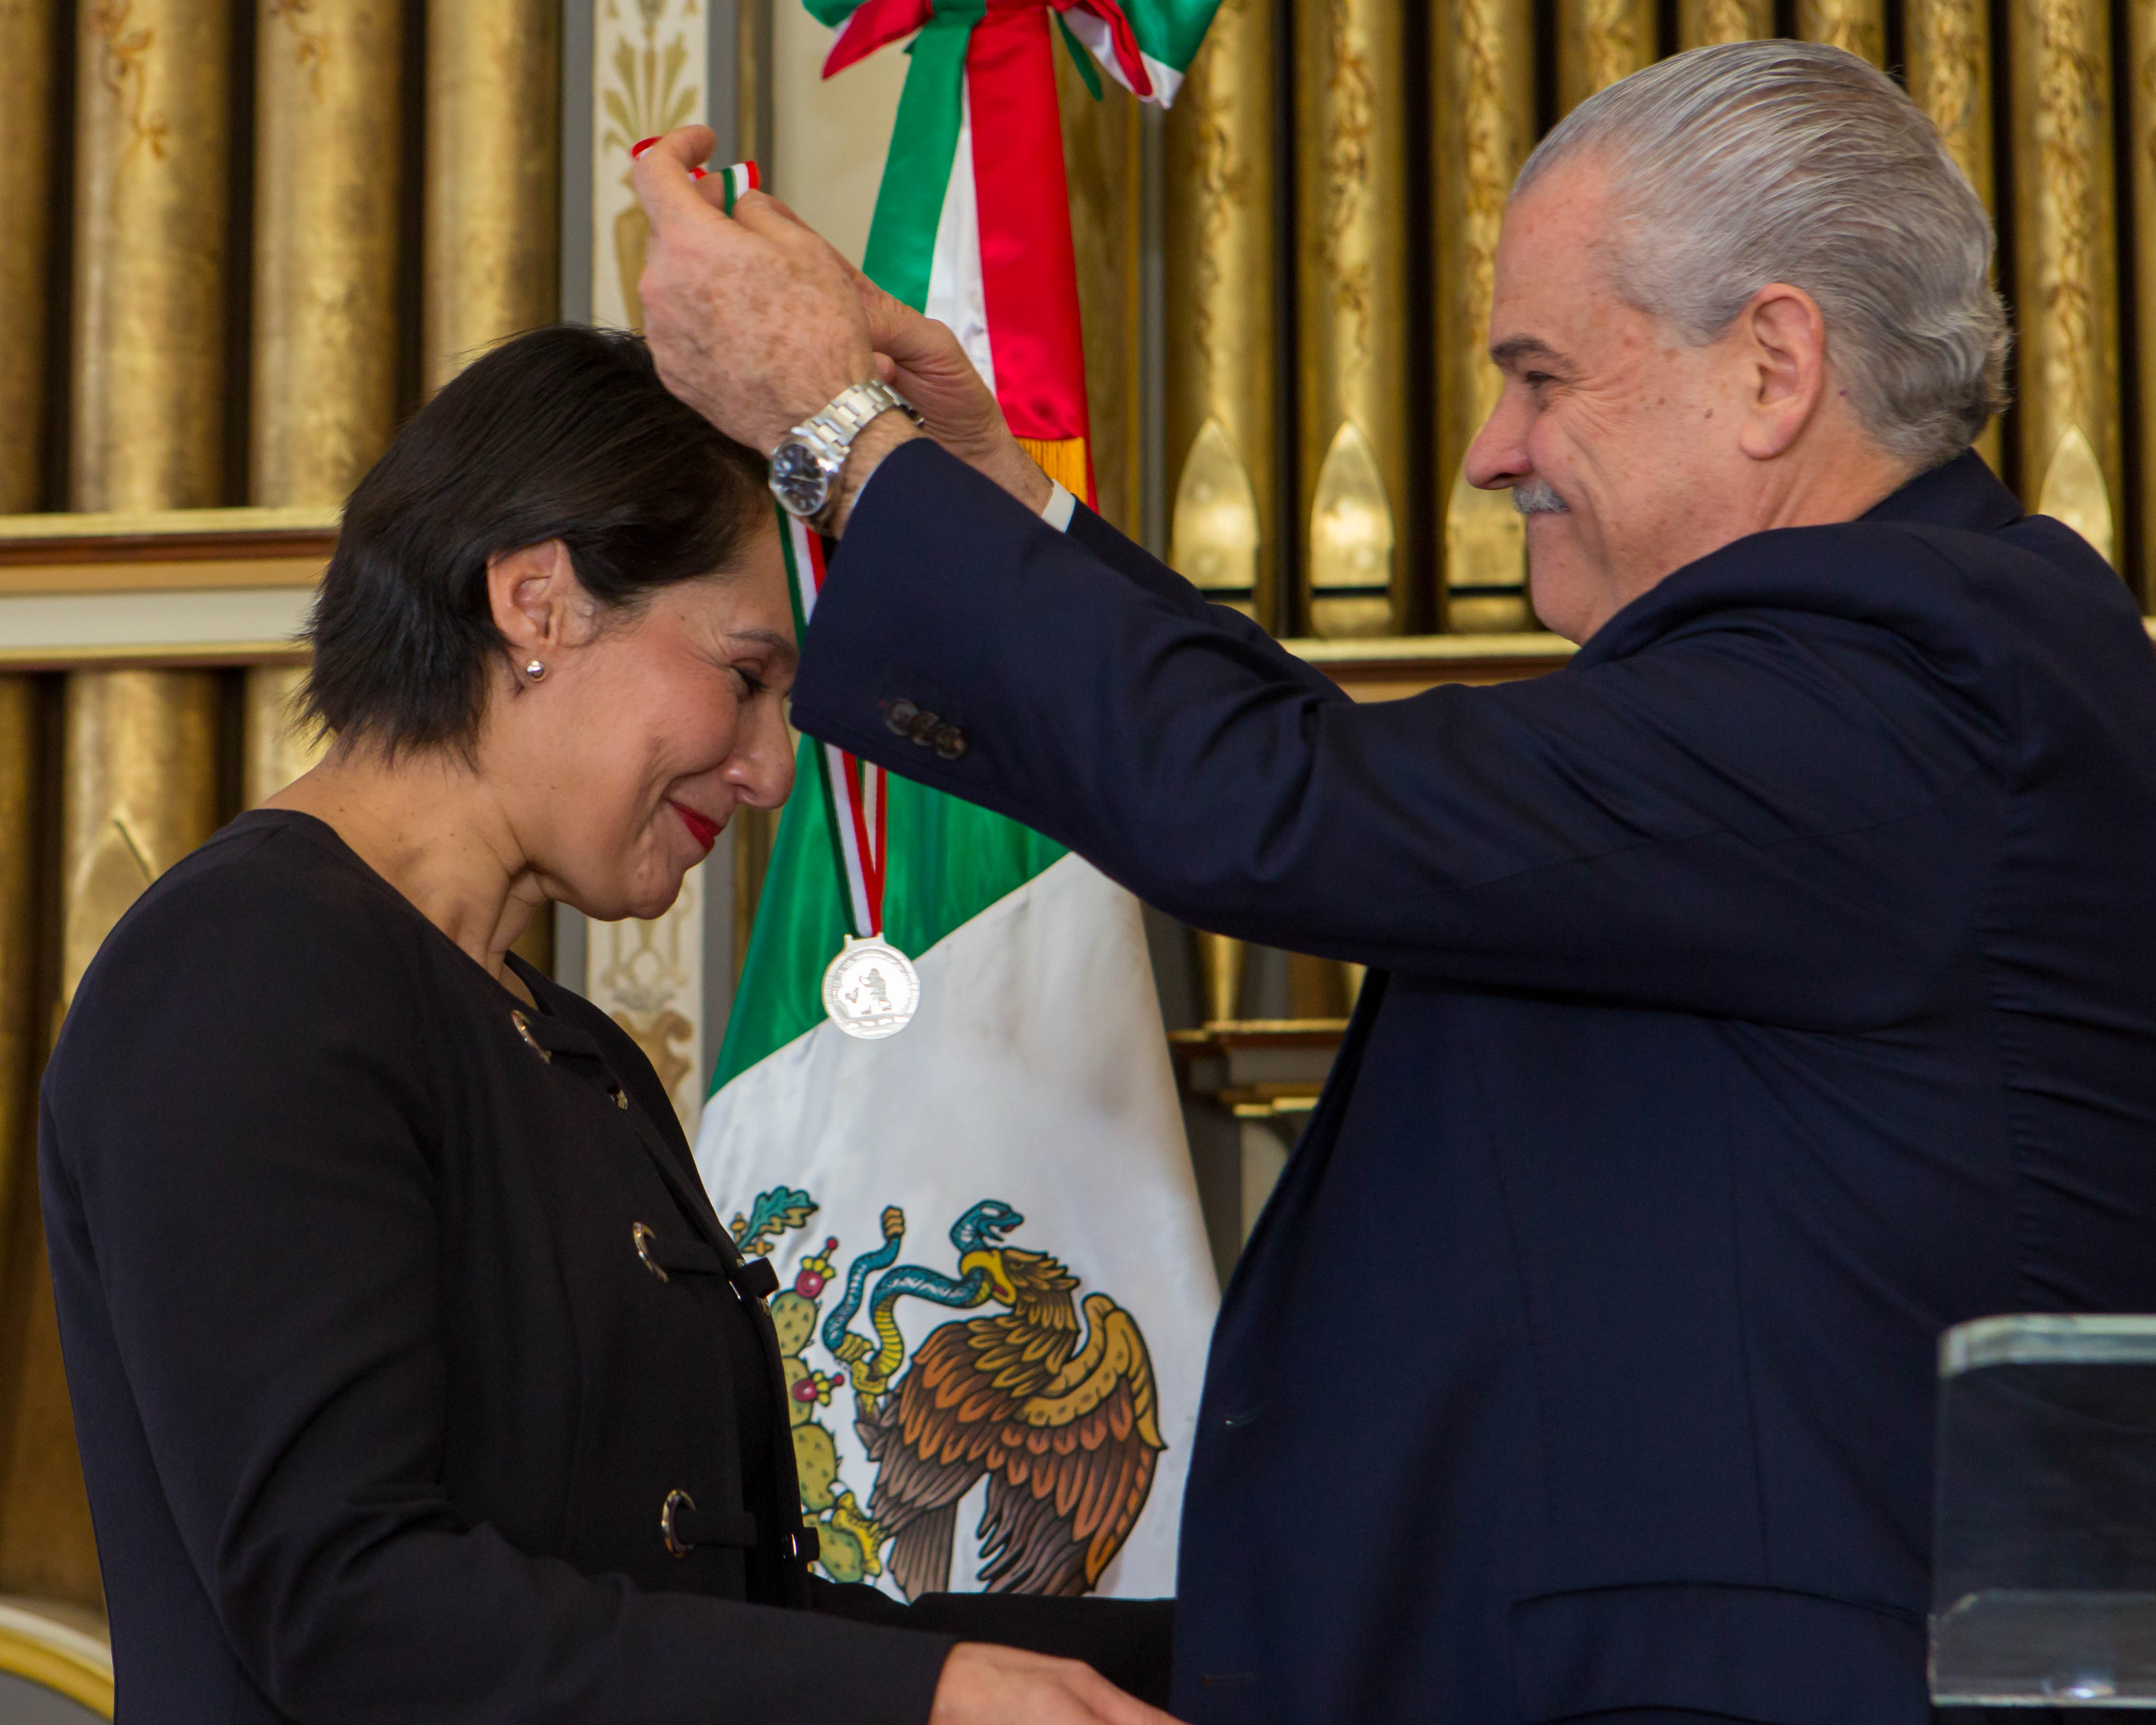 Ana Maria Lepe ohtli award - wikipedia